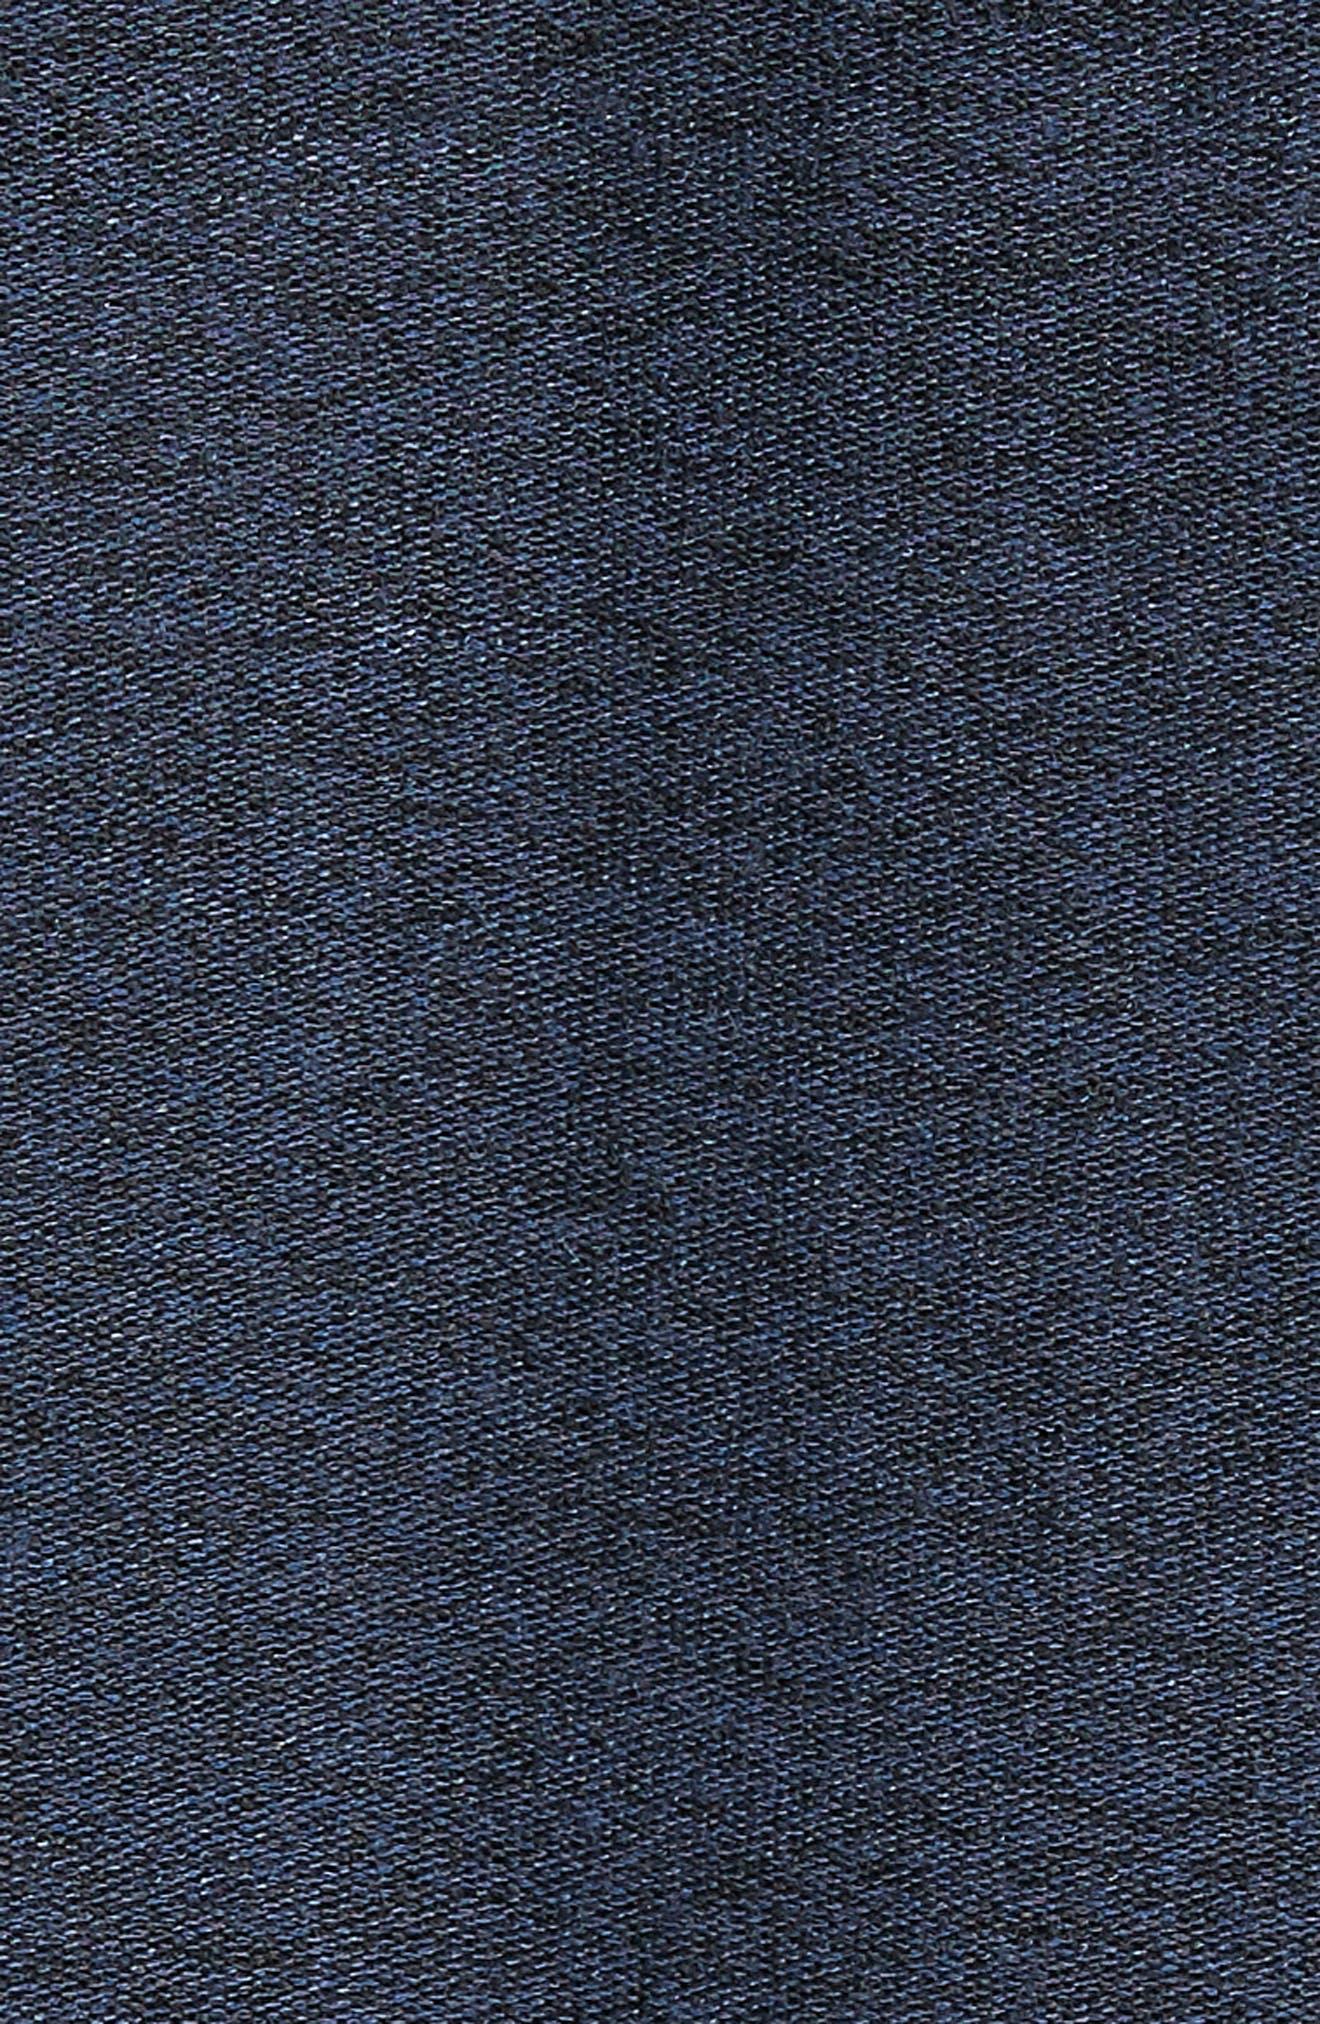 Ultra Soft Crewneck Sweatshirt,                             Alternate thumbnail 5, color,                             Navy Indigo Marl